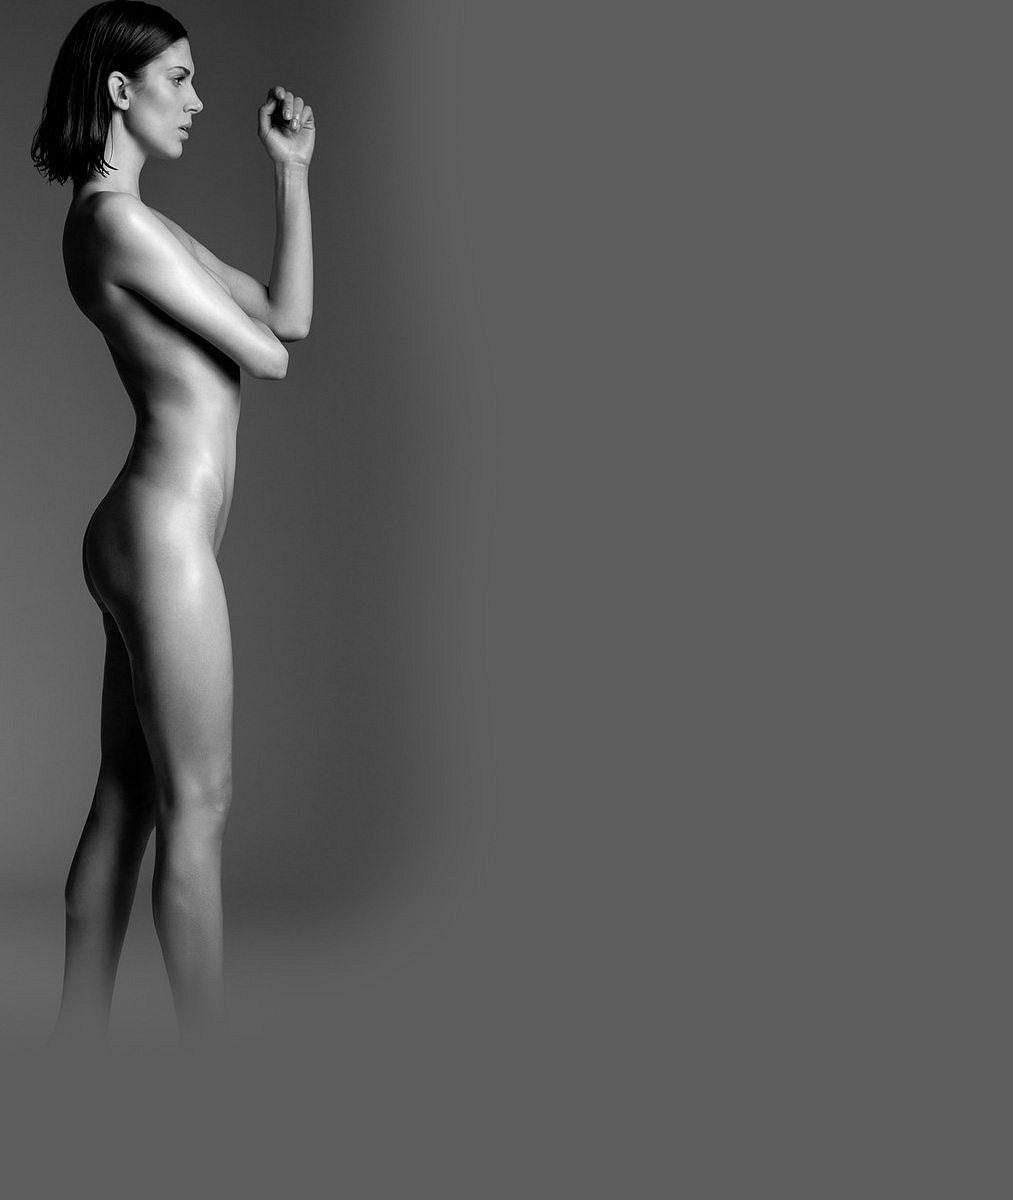 Za chvíli bude chrastit kostmi: Pohublá kráska Vignerová už pomalu nemá čím naplnit krajkovou podprsenku